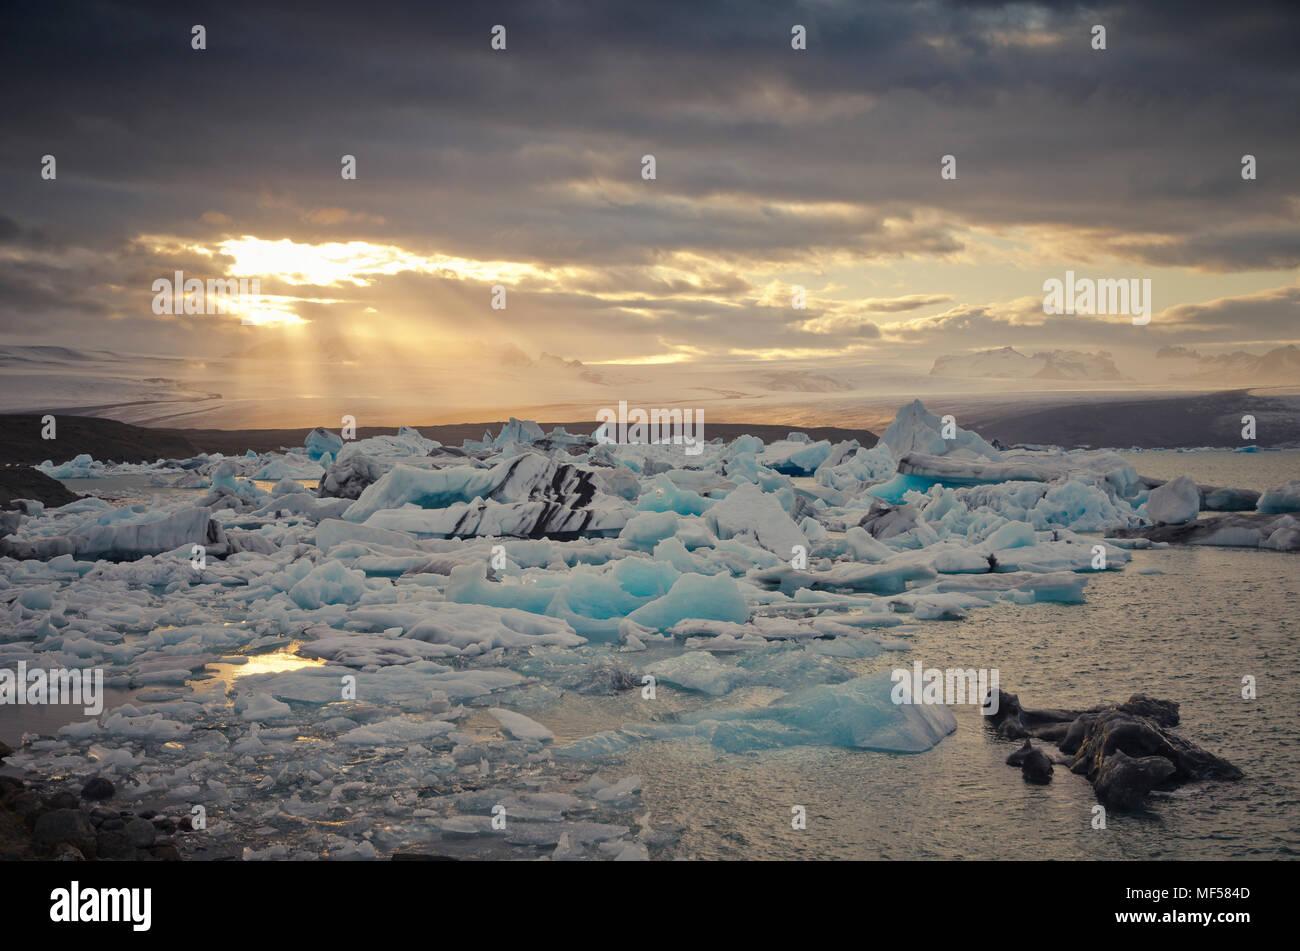 Iceland, South of Iceland, Joekulsarlon glacier lake, icebergs and sunshine through clouds - Stock Image